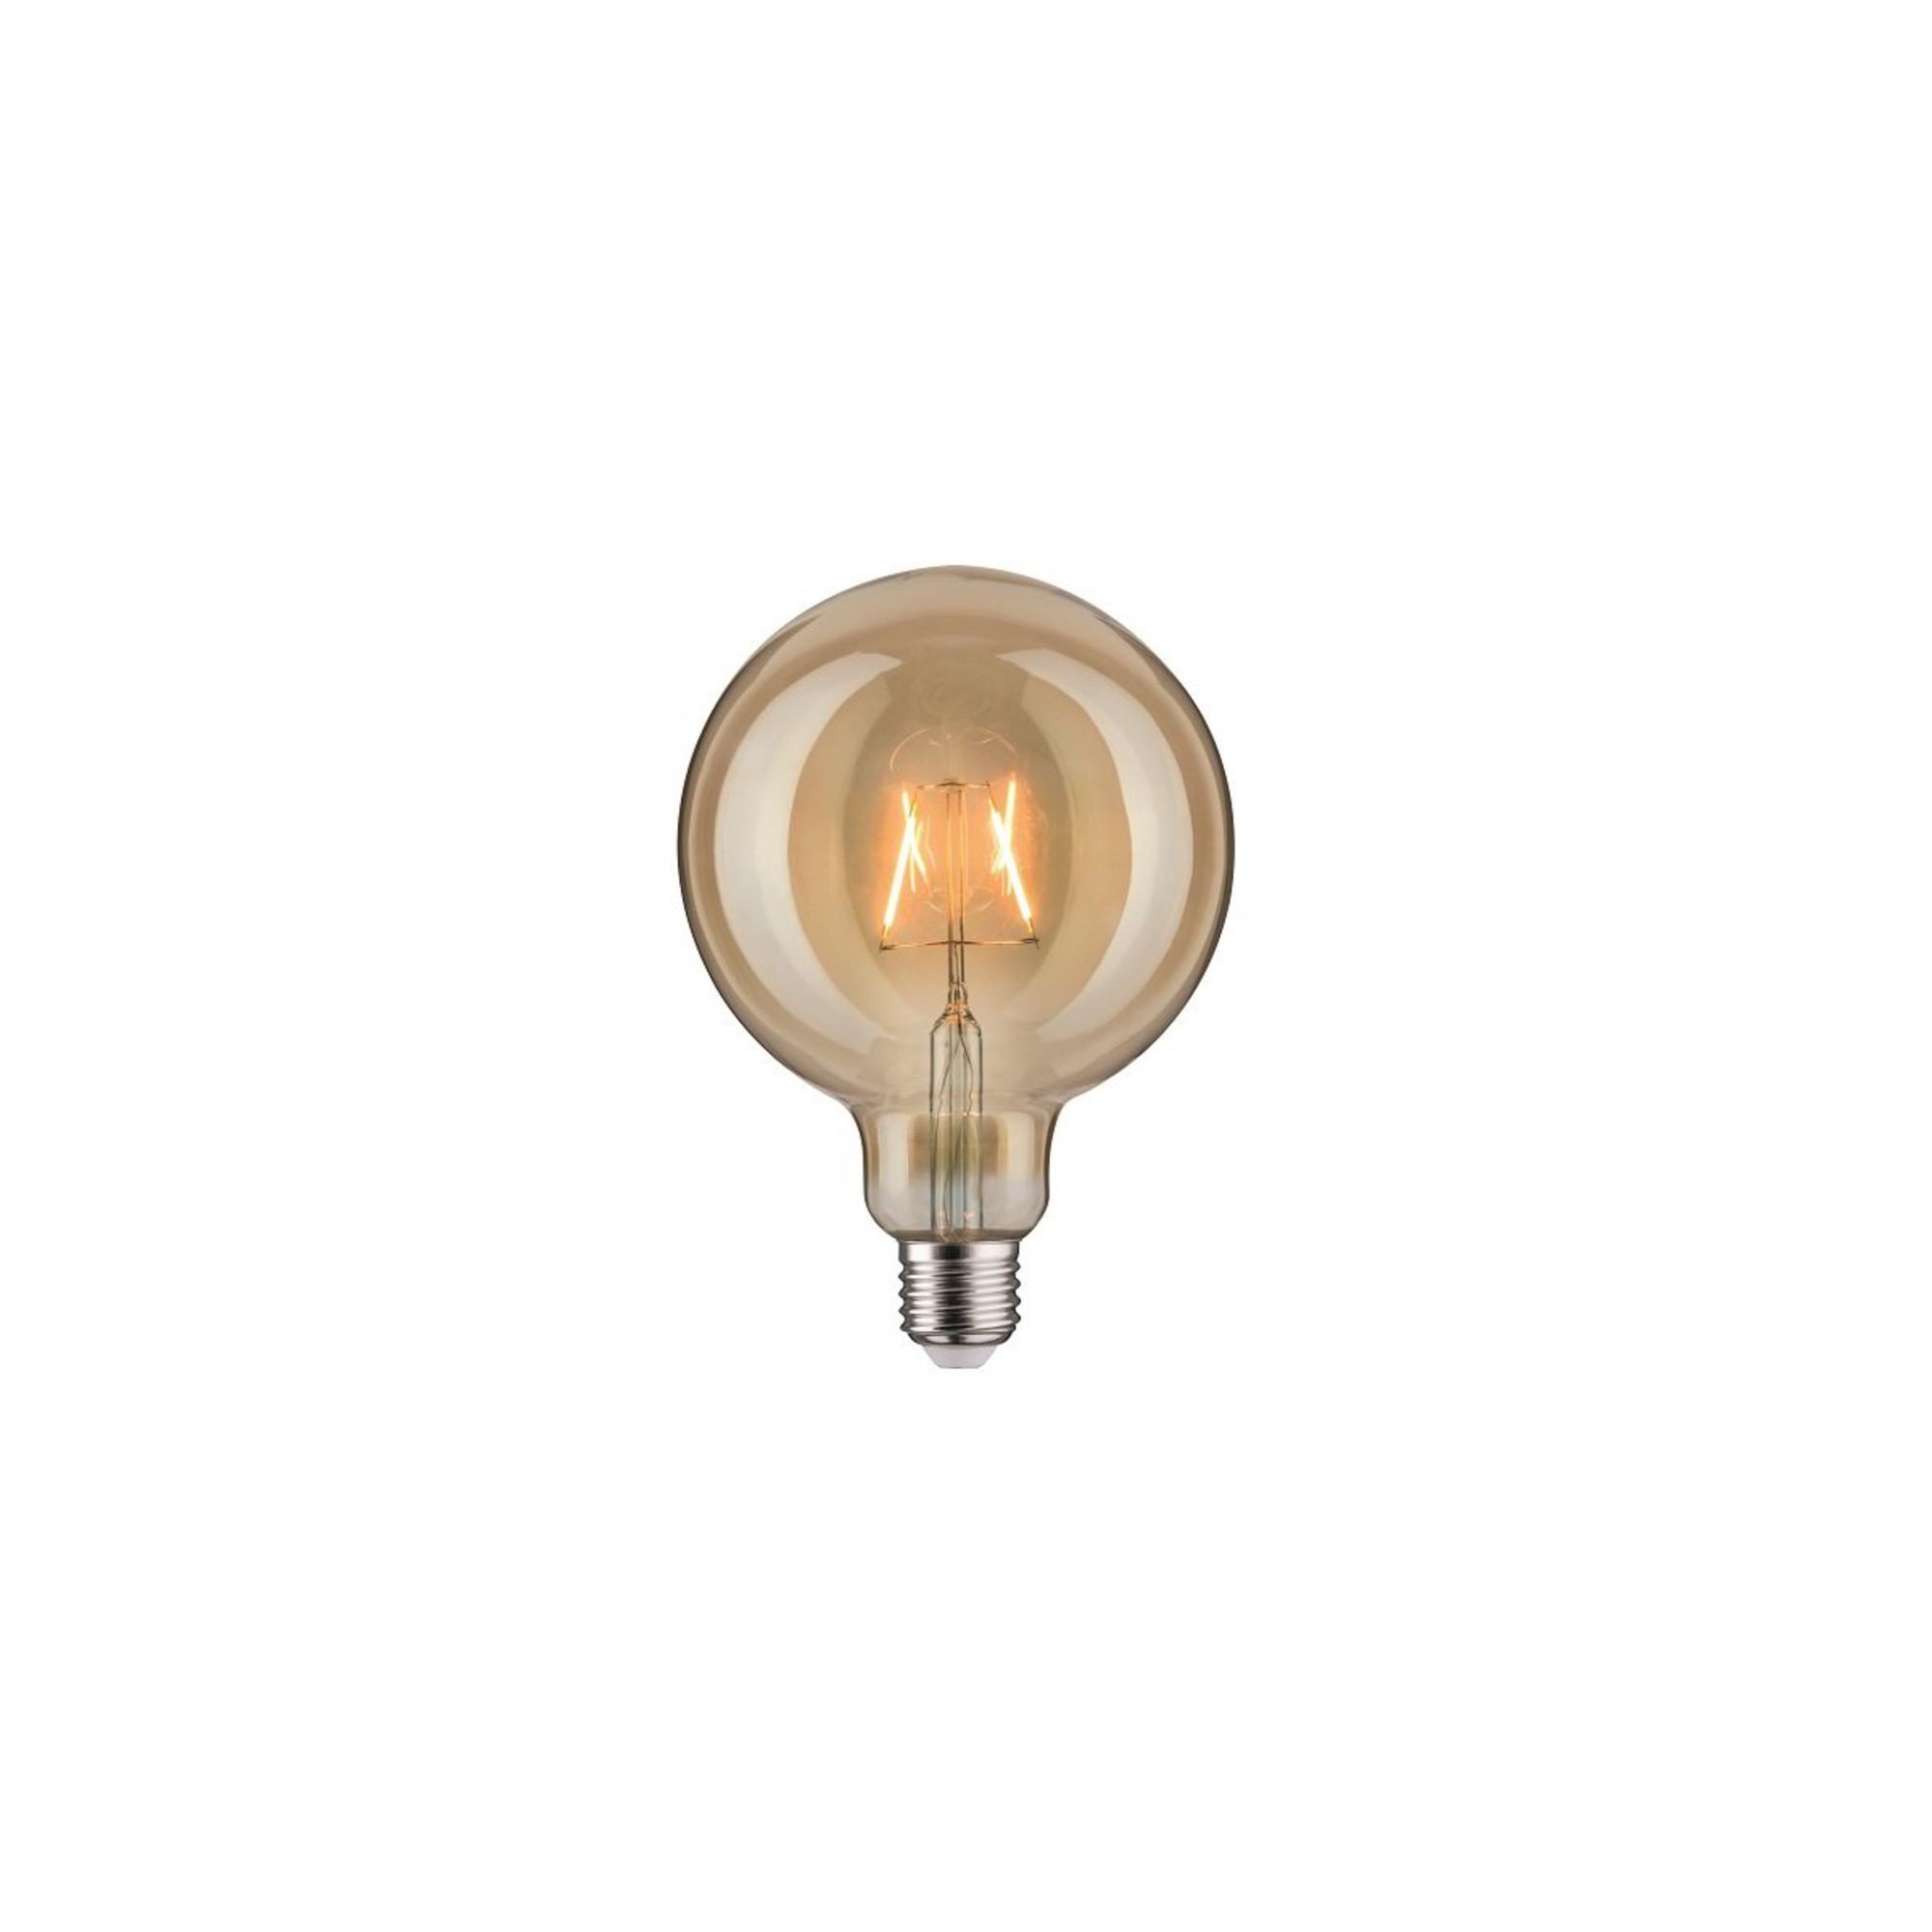 Лампа филаментная Paulmann Vintage Шар G125 2.5Вт 170лм 1700К Е27 230В Золото 28401.